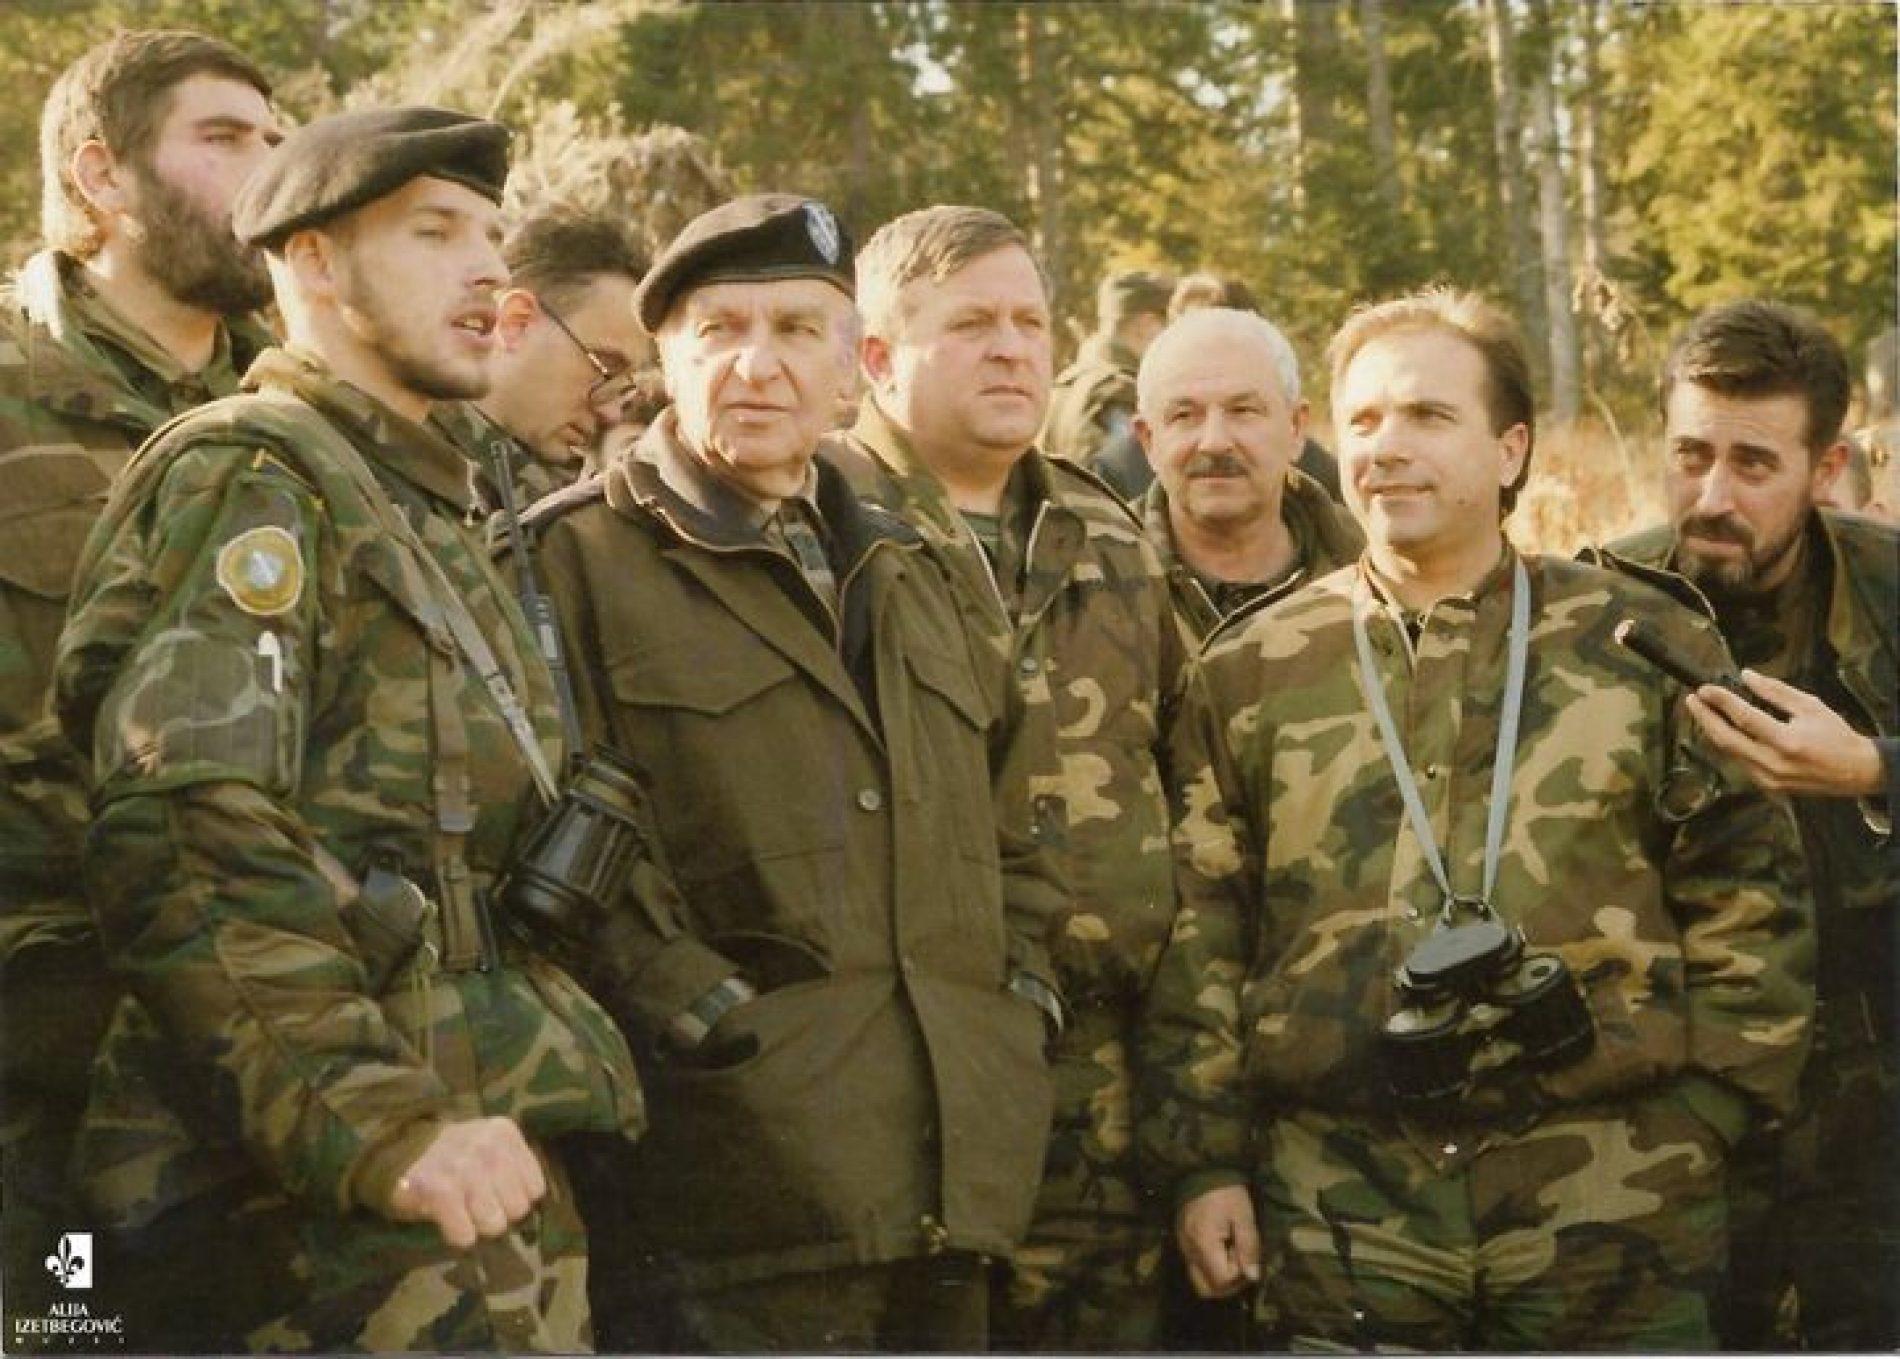 Na današnji dan dva korpusa ARBiH spojila dva velika bosanska centra – Tuzlu i Zenicu